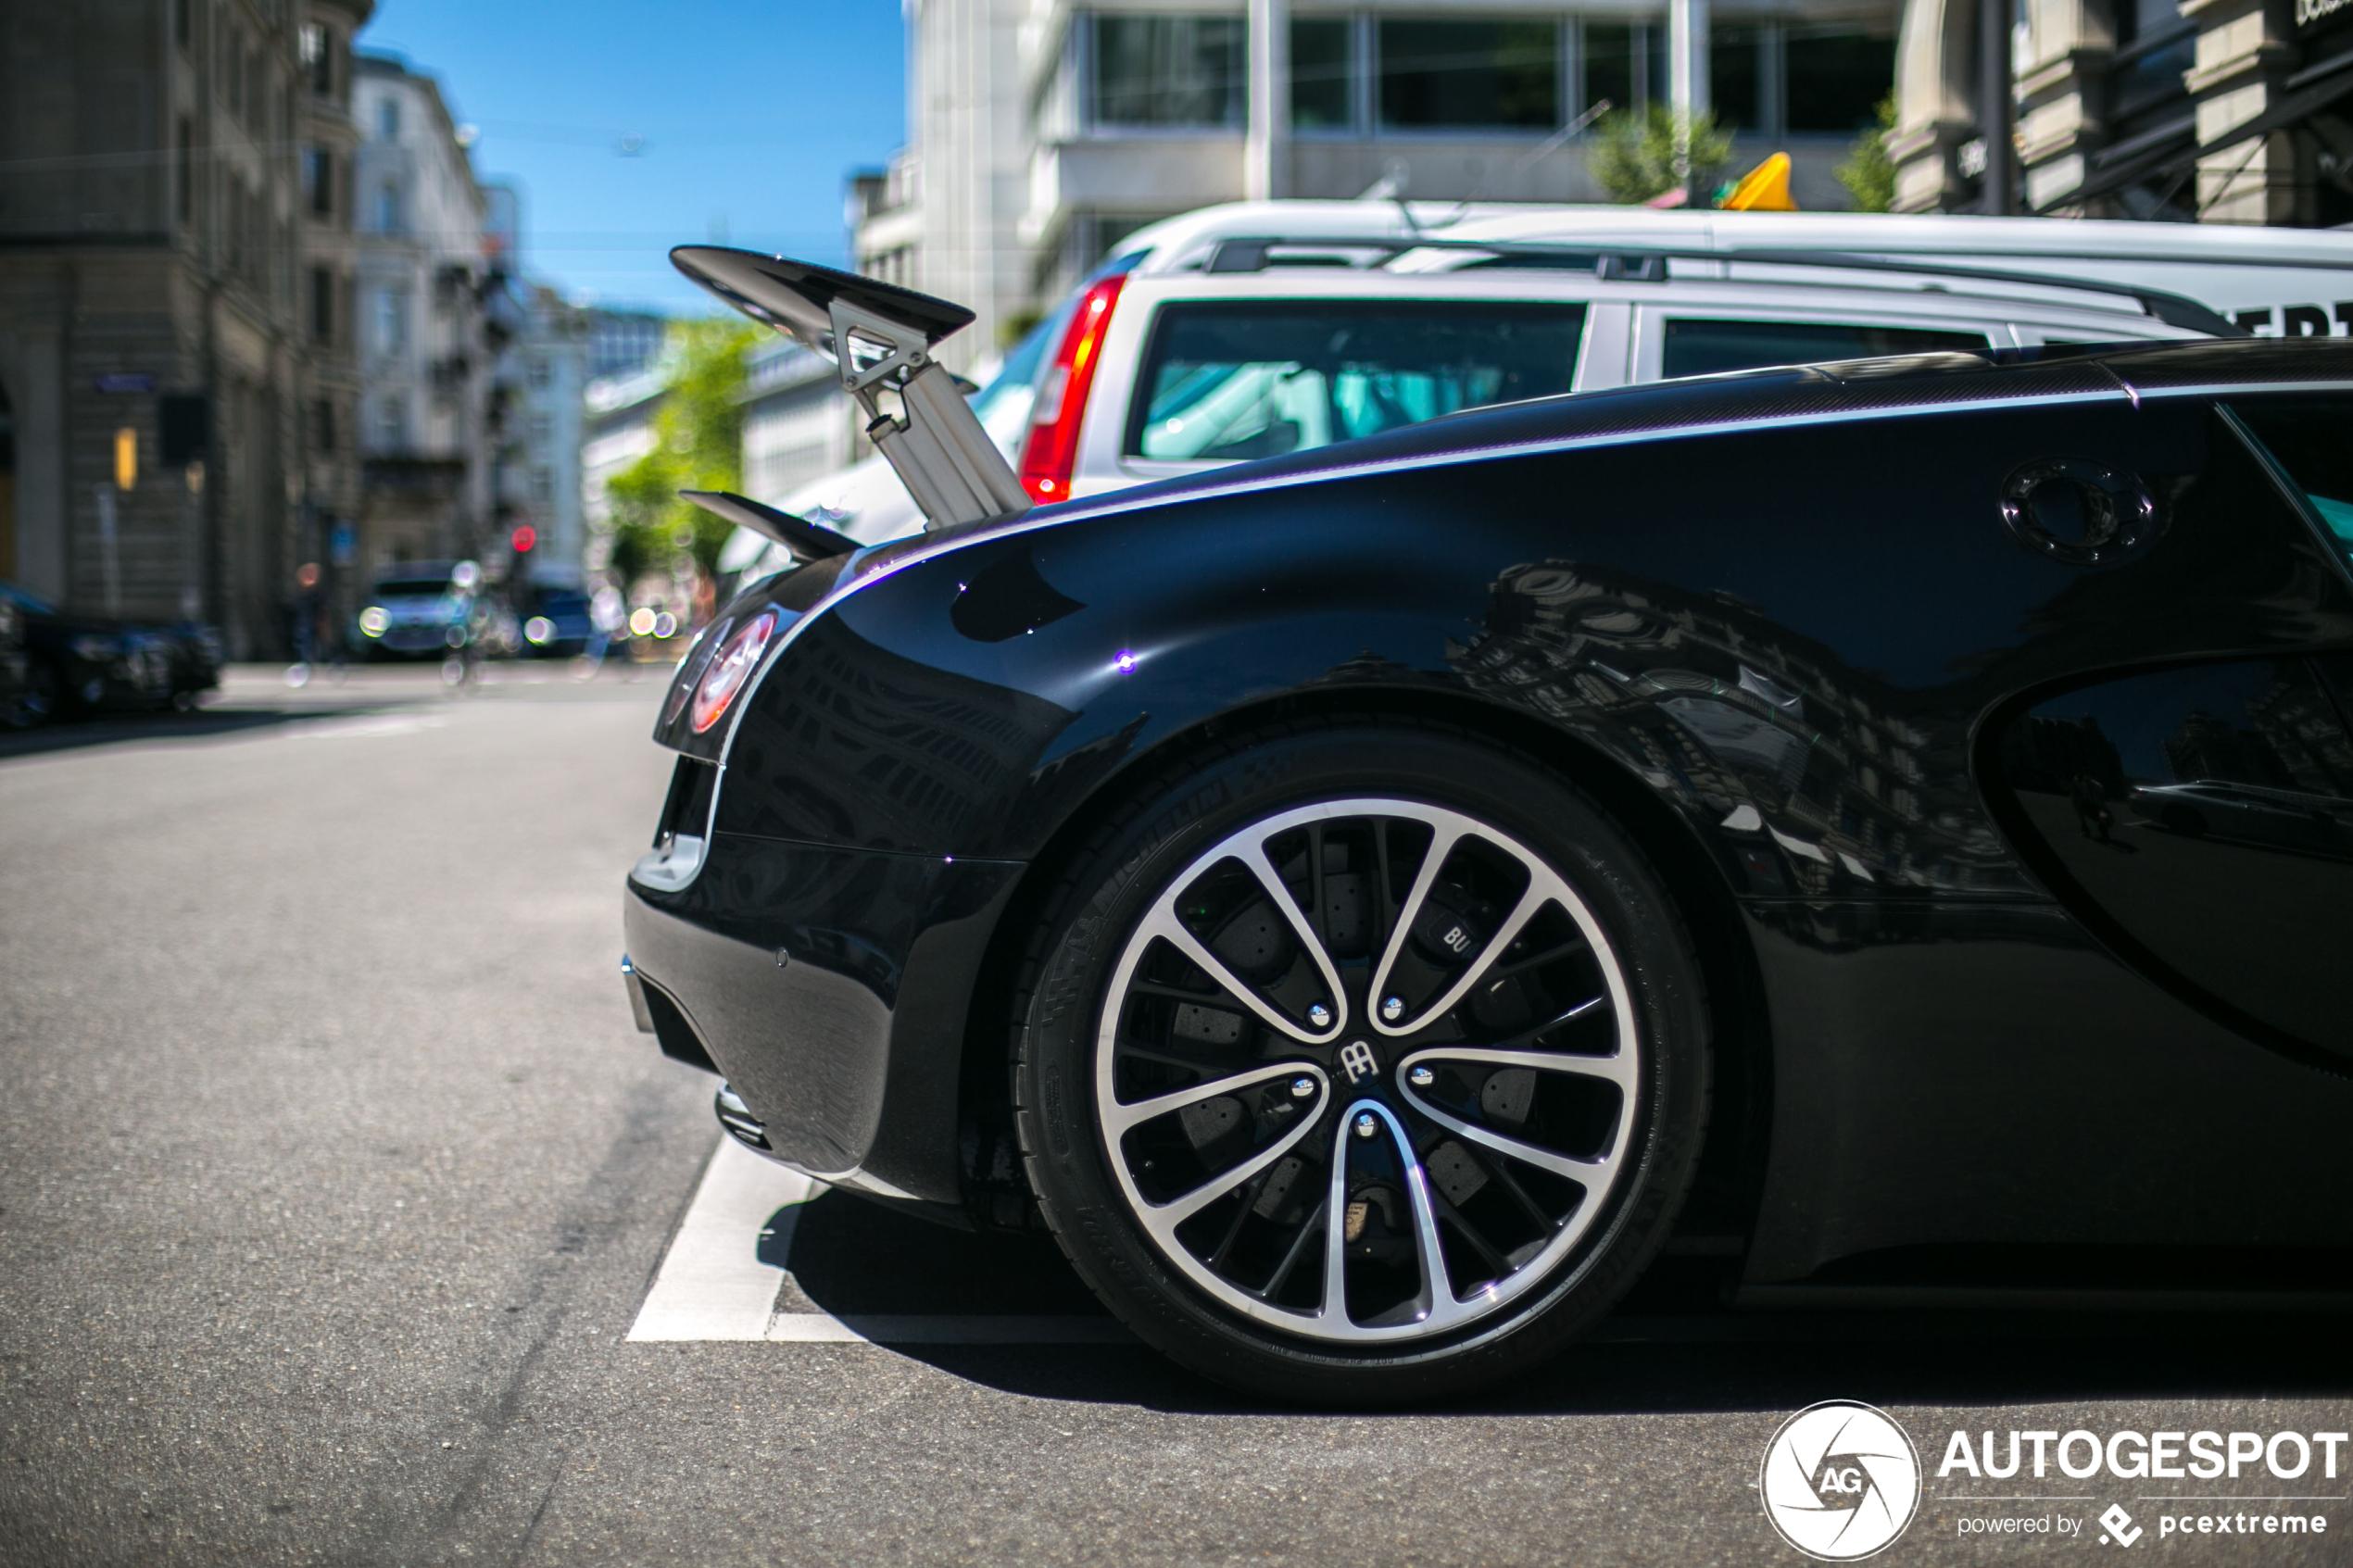 Bugatti Veyron 16.4 Super Sport maakt indruk met zijn vleugel